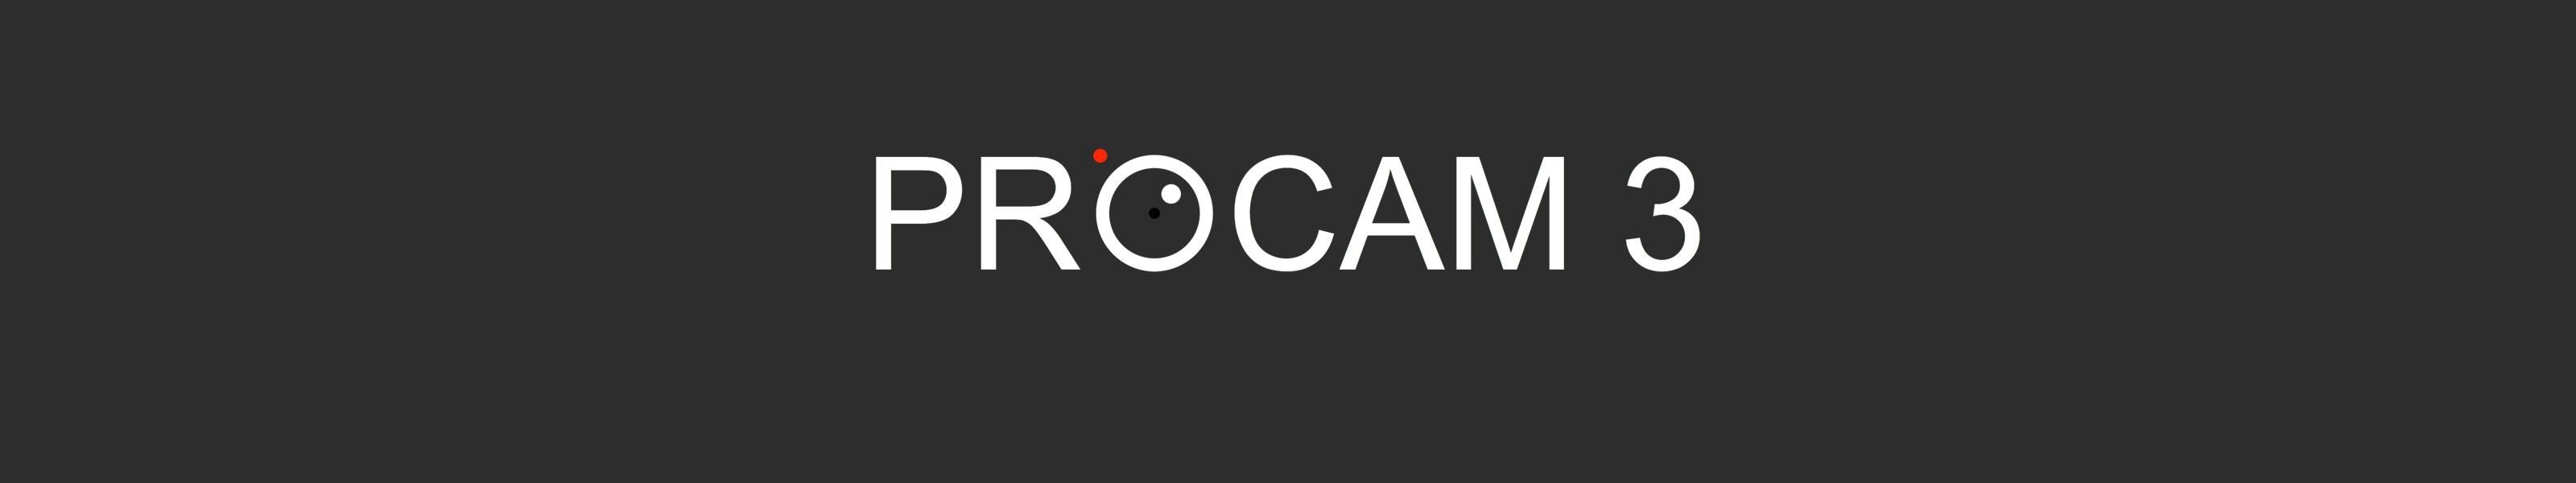 ProCam 3 banner background treatment